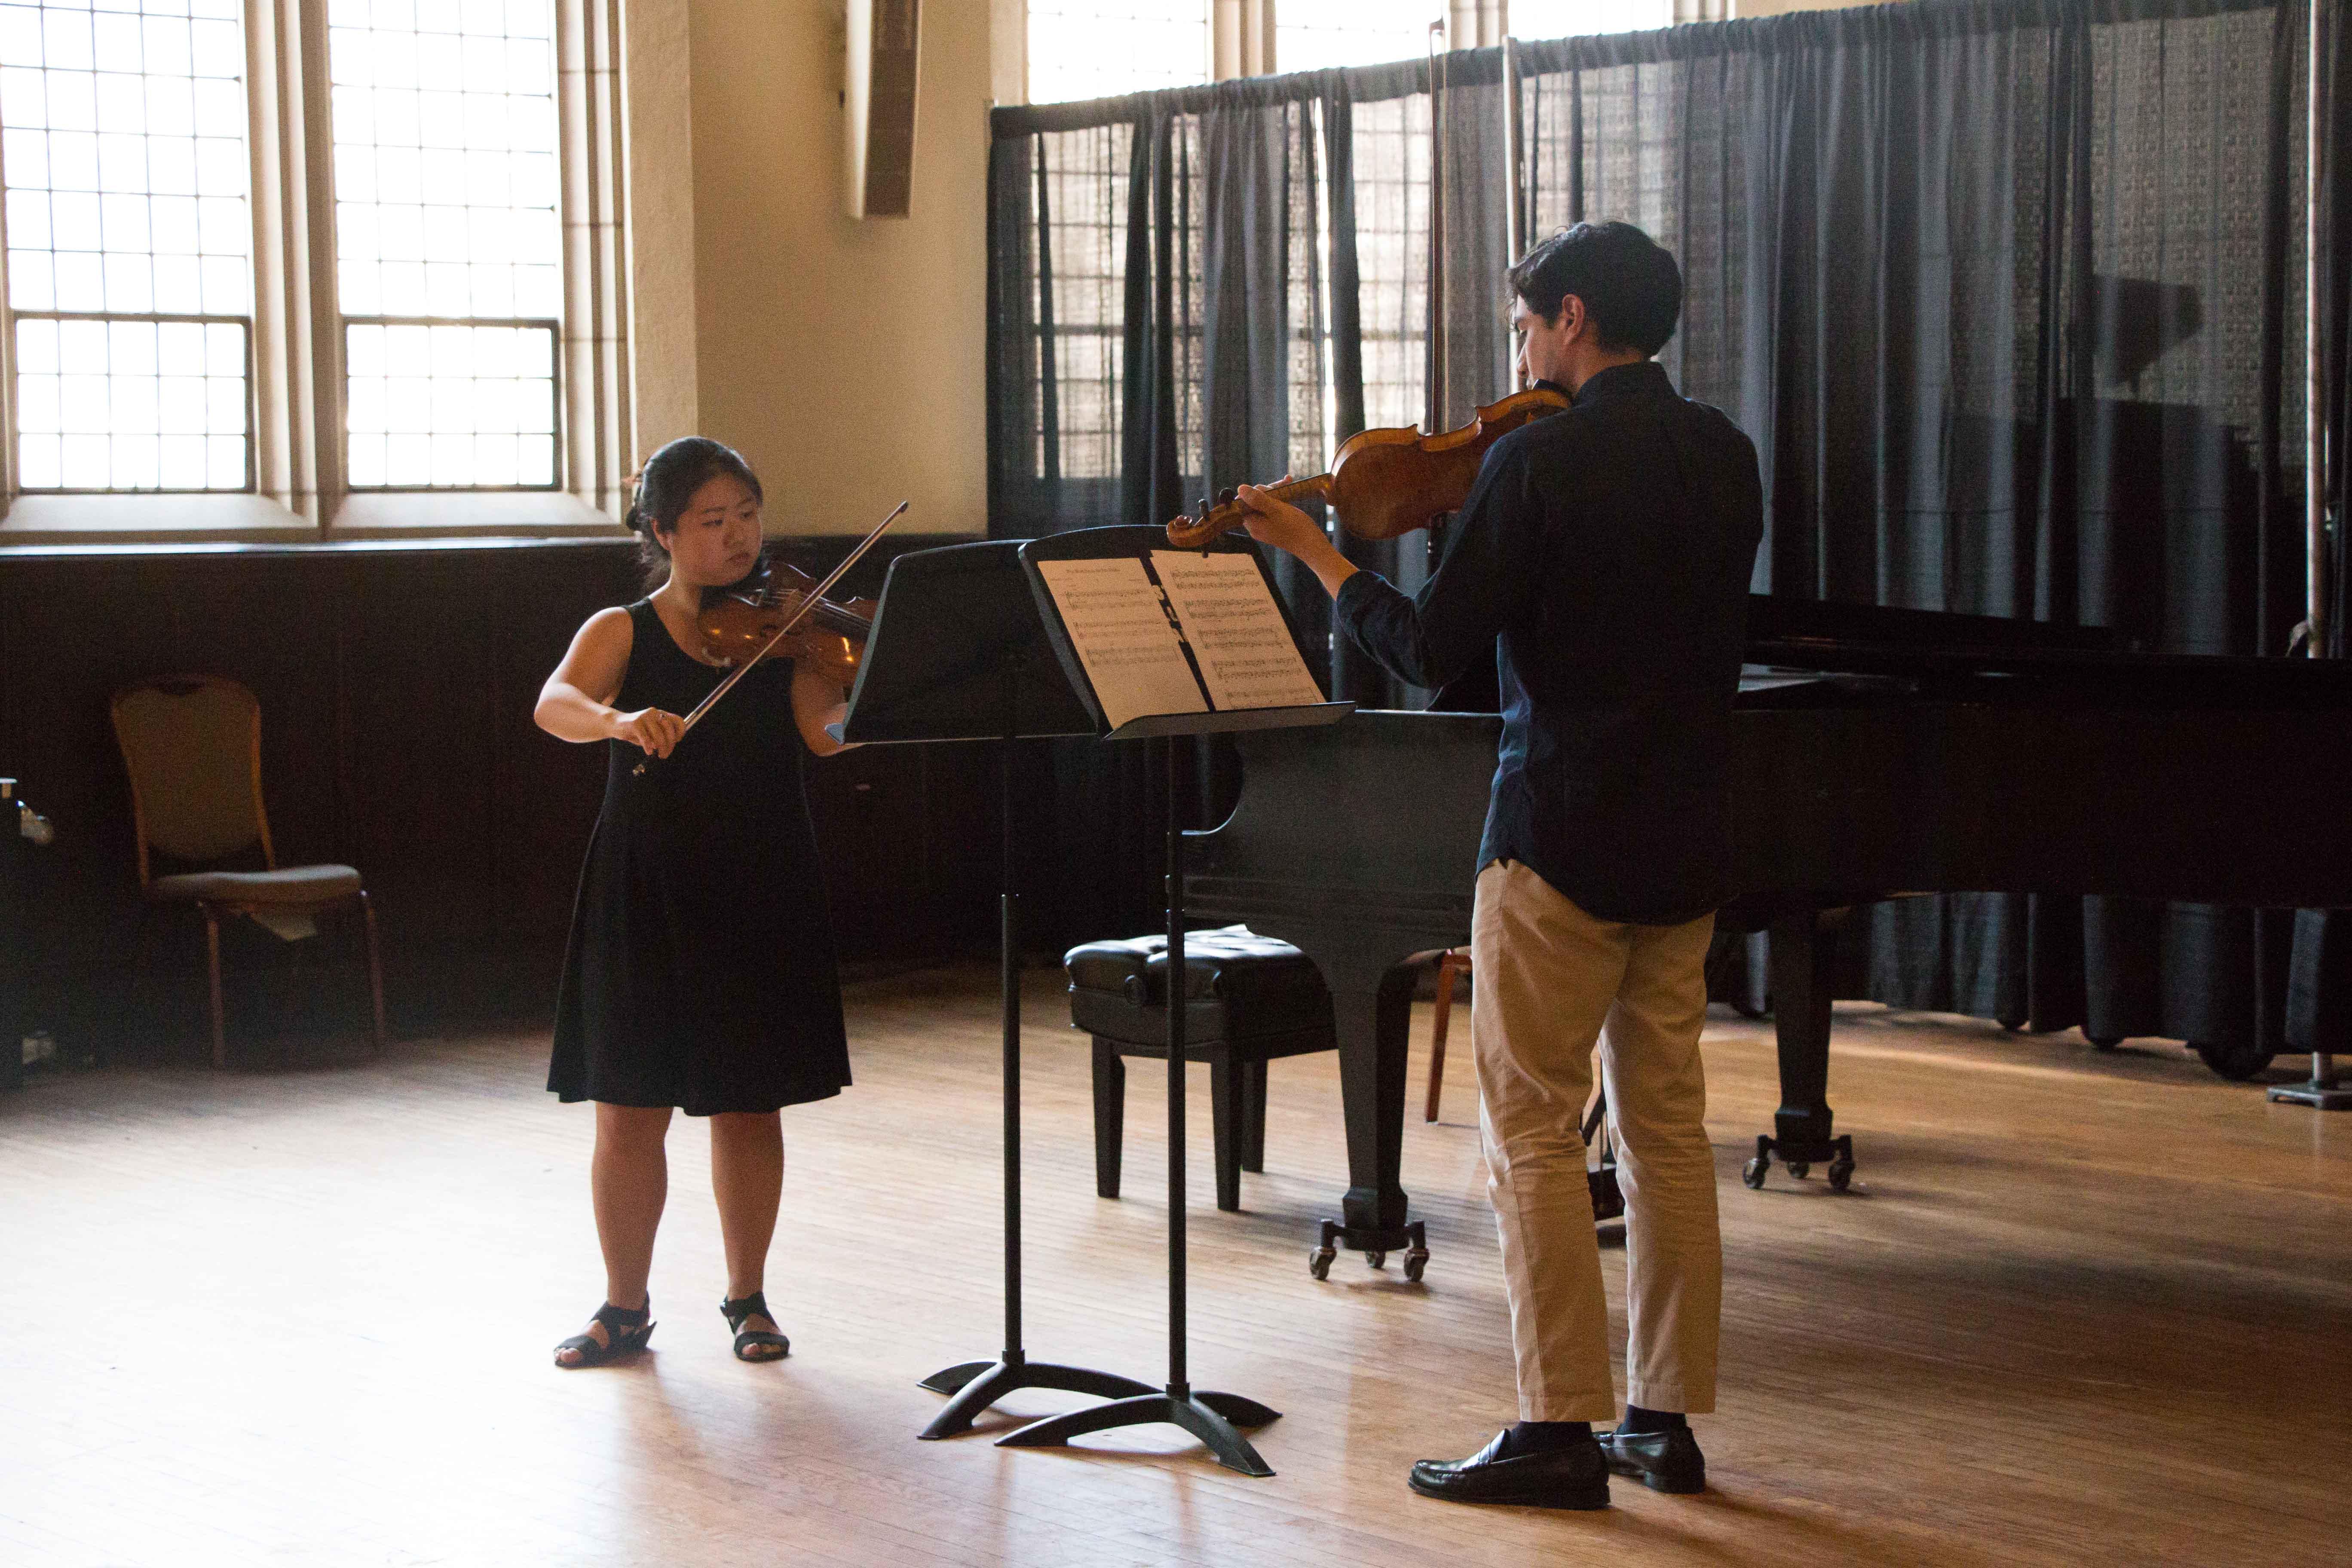 chamber music society (online)